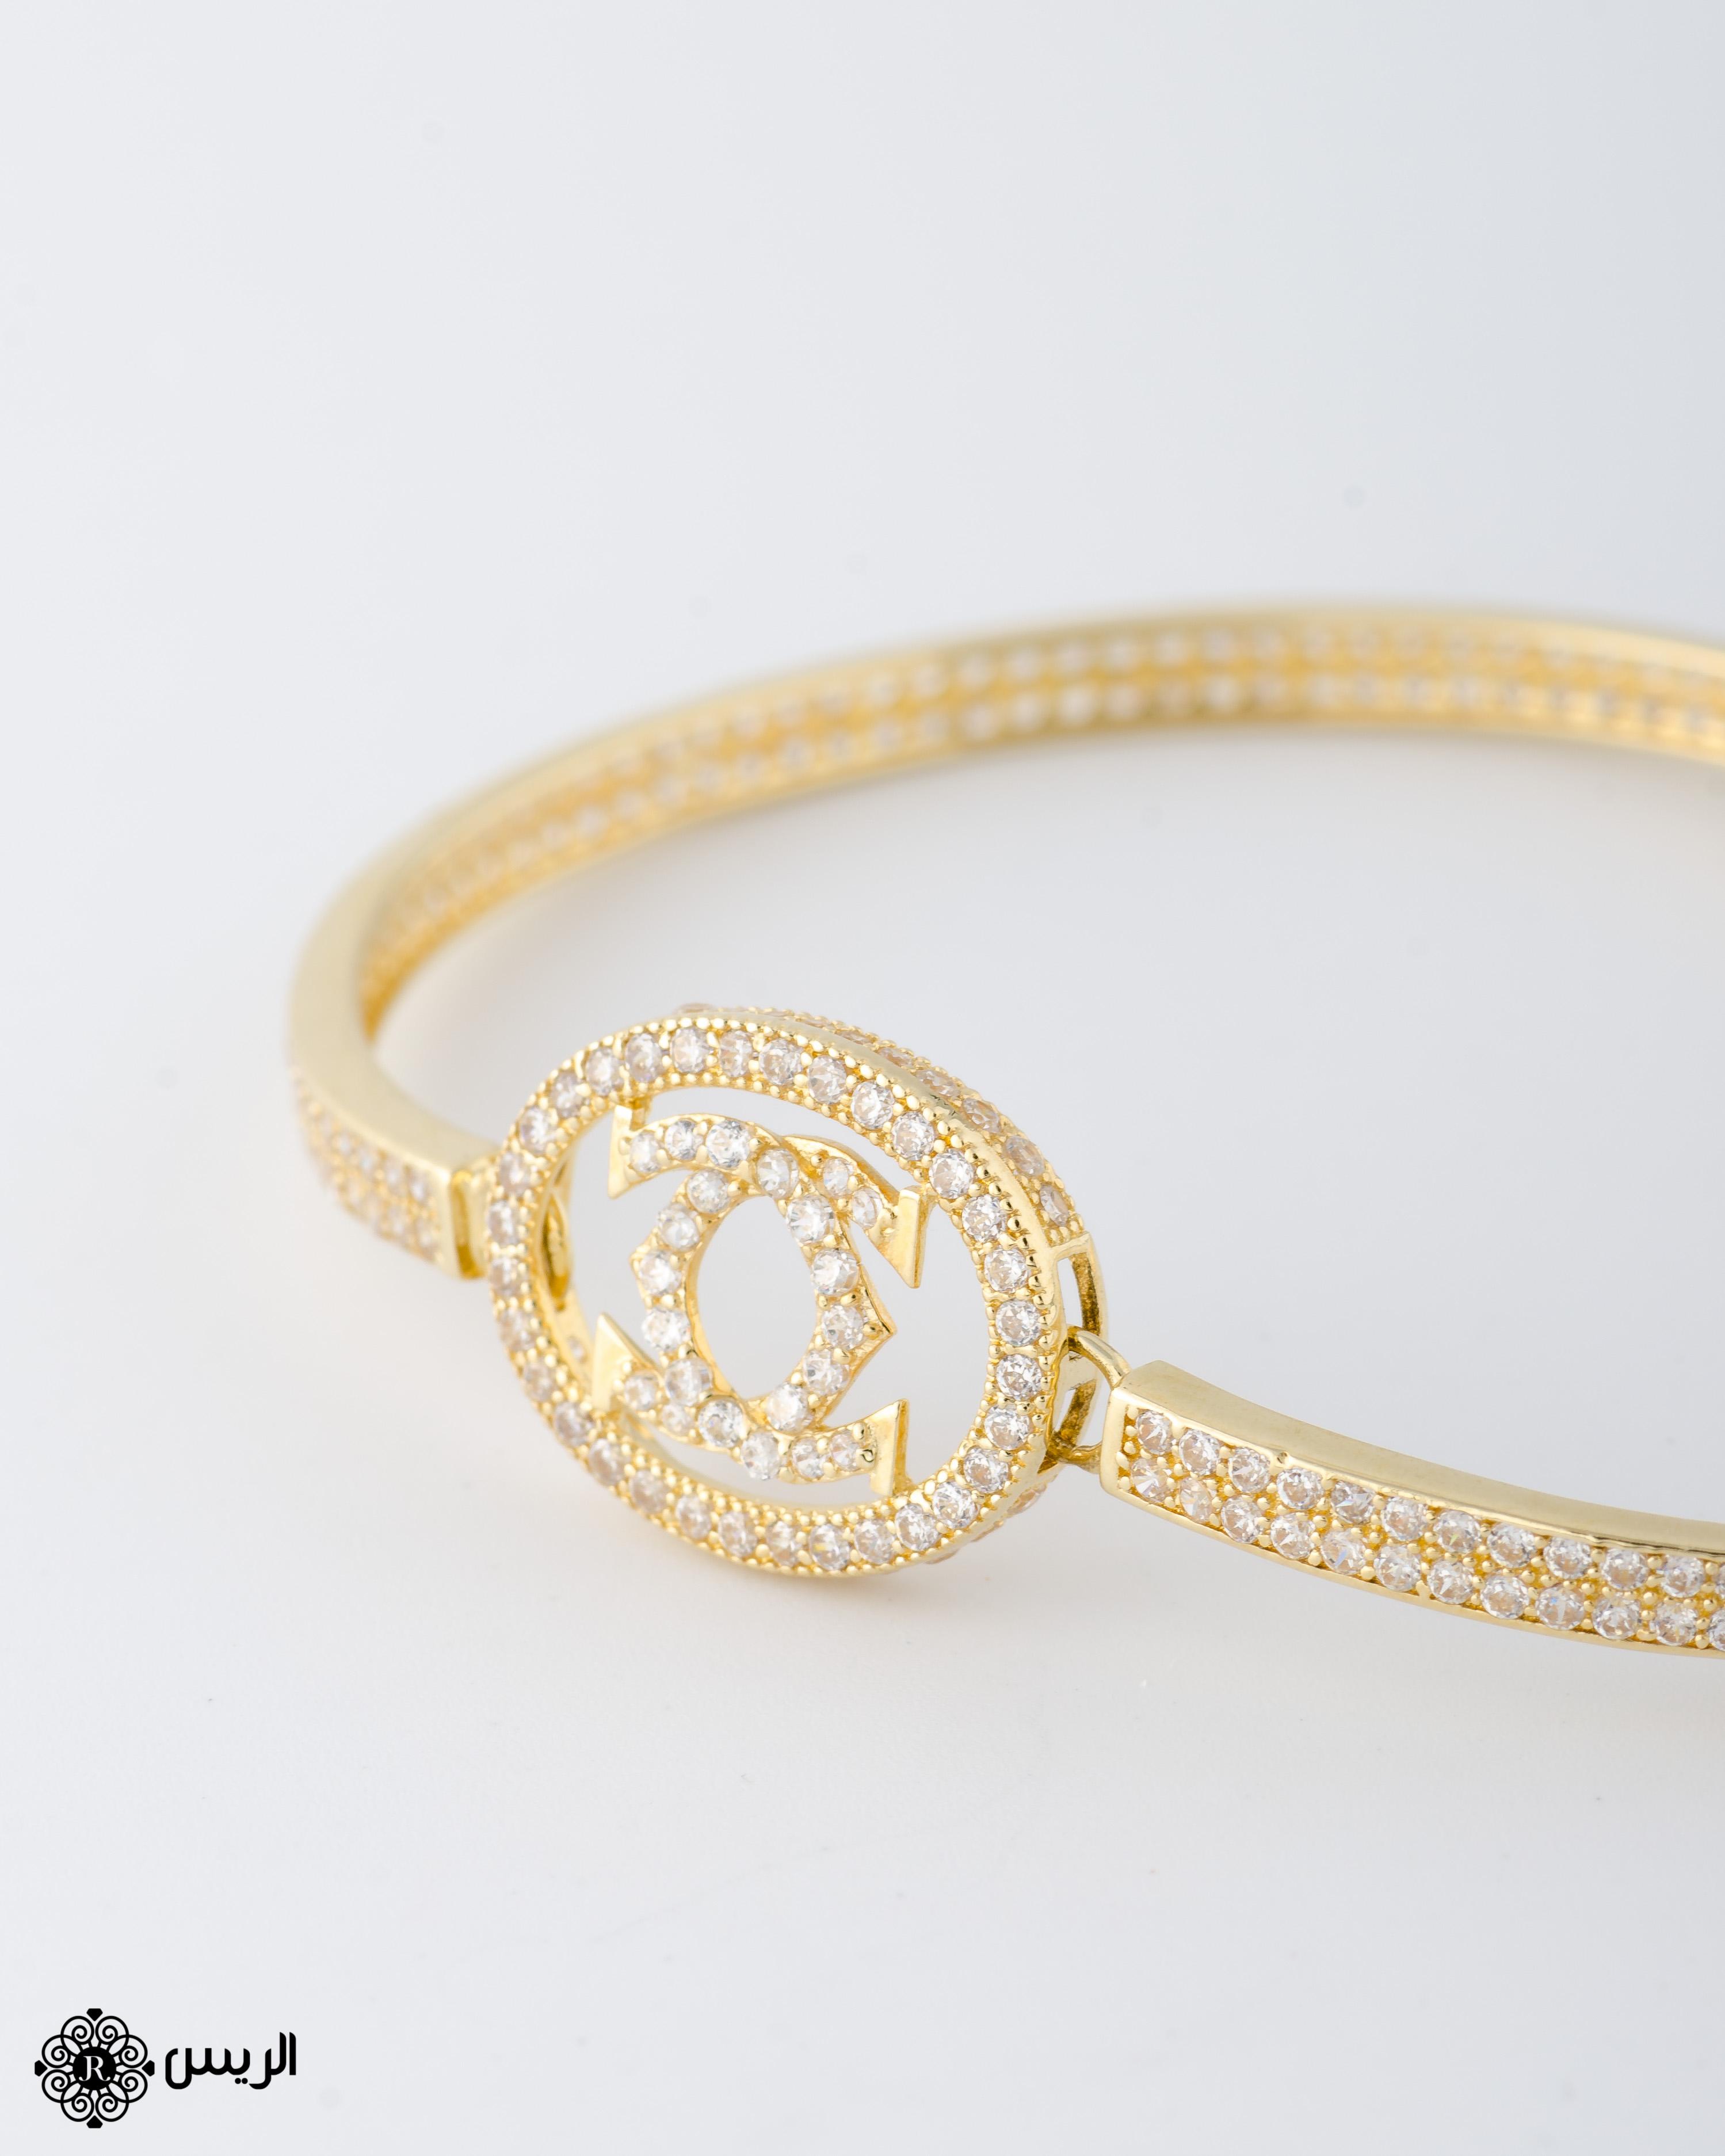 Raies jewelry Bangle Classic Design إسورة تصميم كلاسيكي الريس للمجوهرات